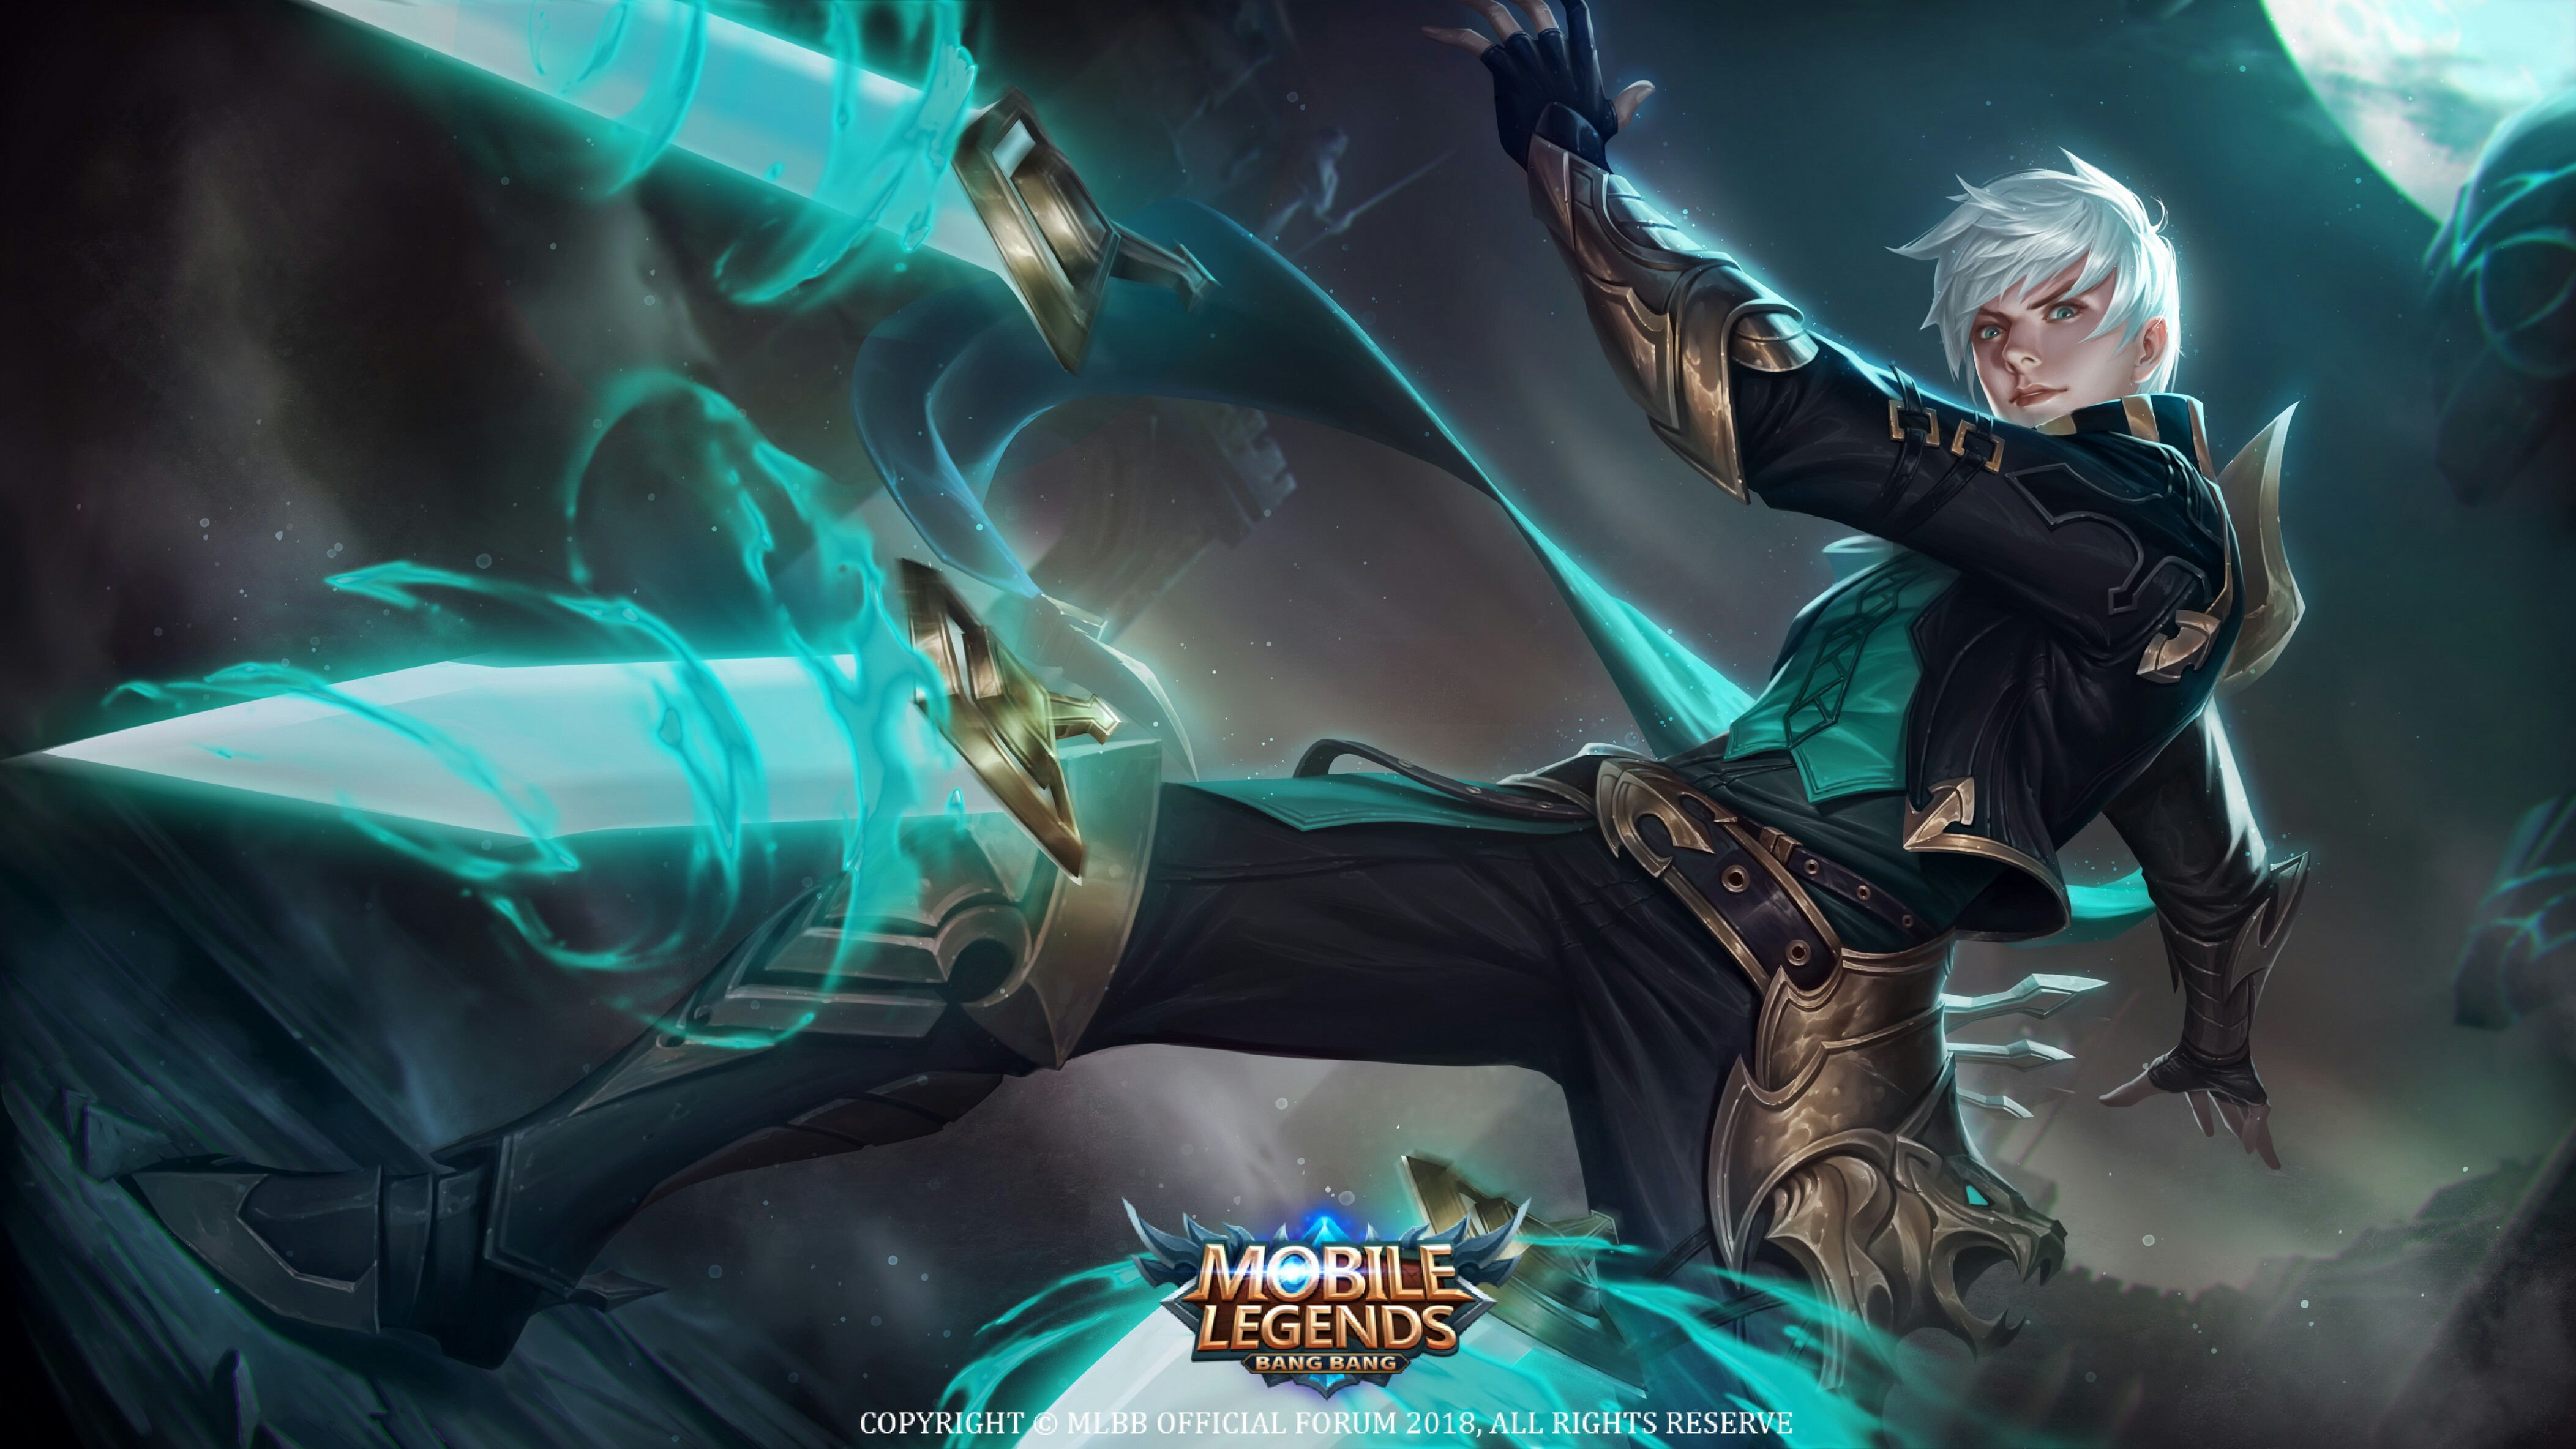 Logo Mobile Legends HD Wallpapers - Wallpaper Cave